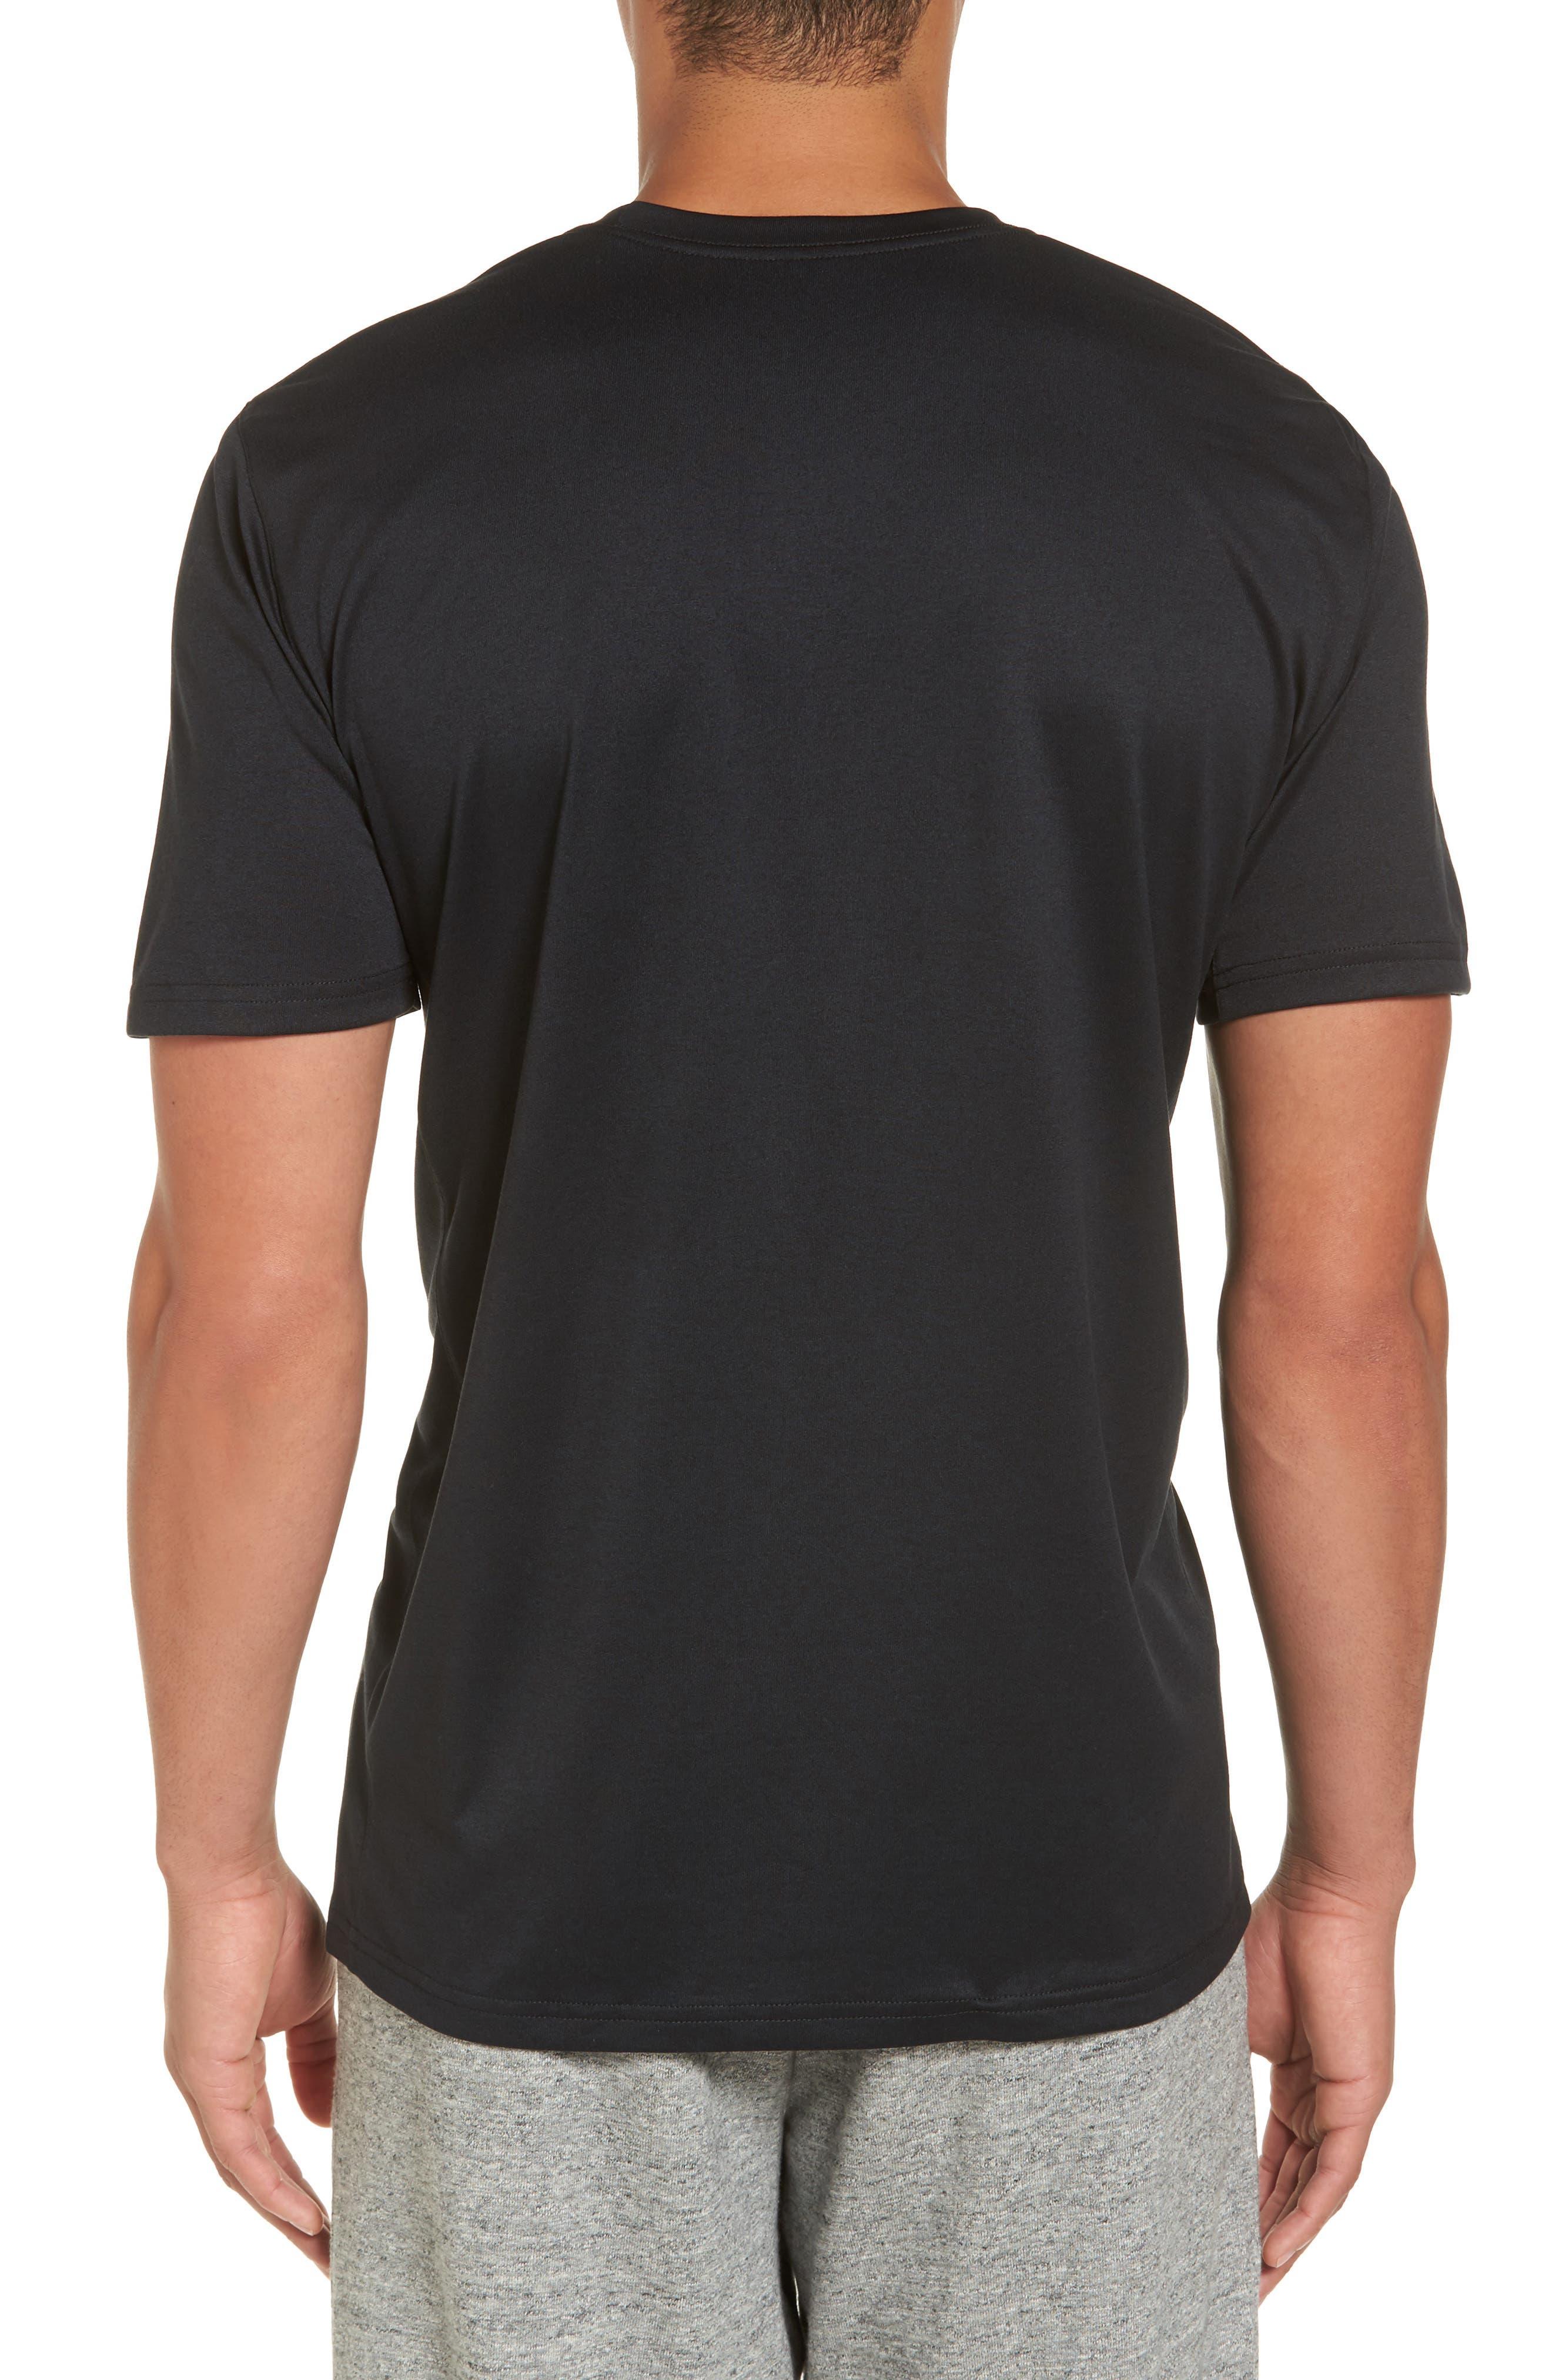 Dry Legend Training T-Shirt,                             Alternate thumbnail 2, color,                             Black